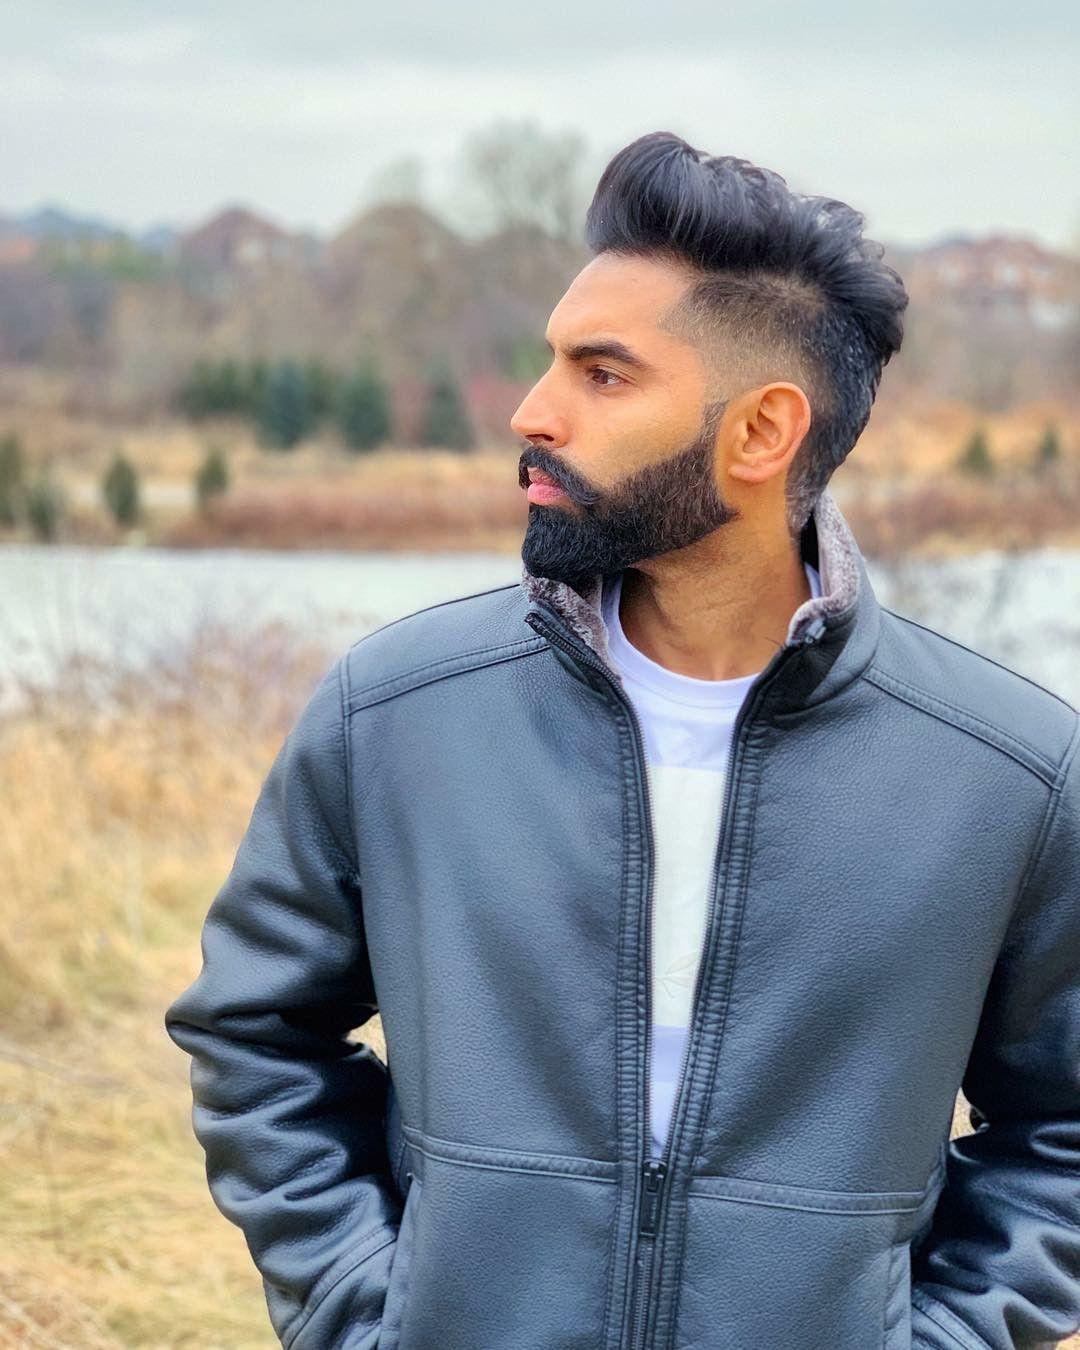 Parmish Verma Handsome Indian Men Hipster Hairstyles Men Parmish Verma Beard